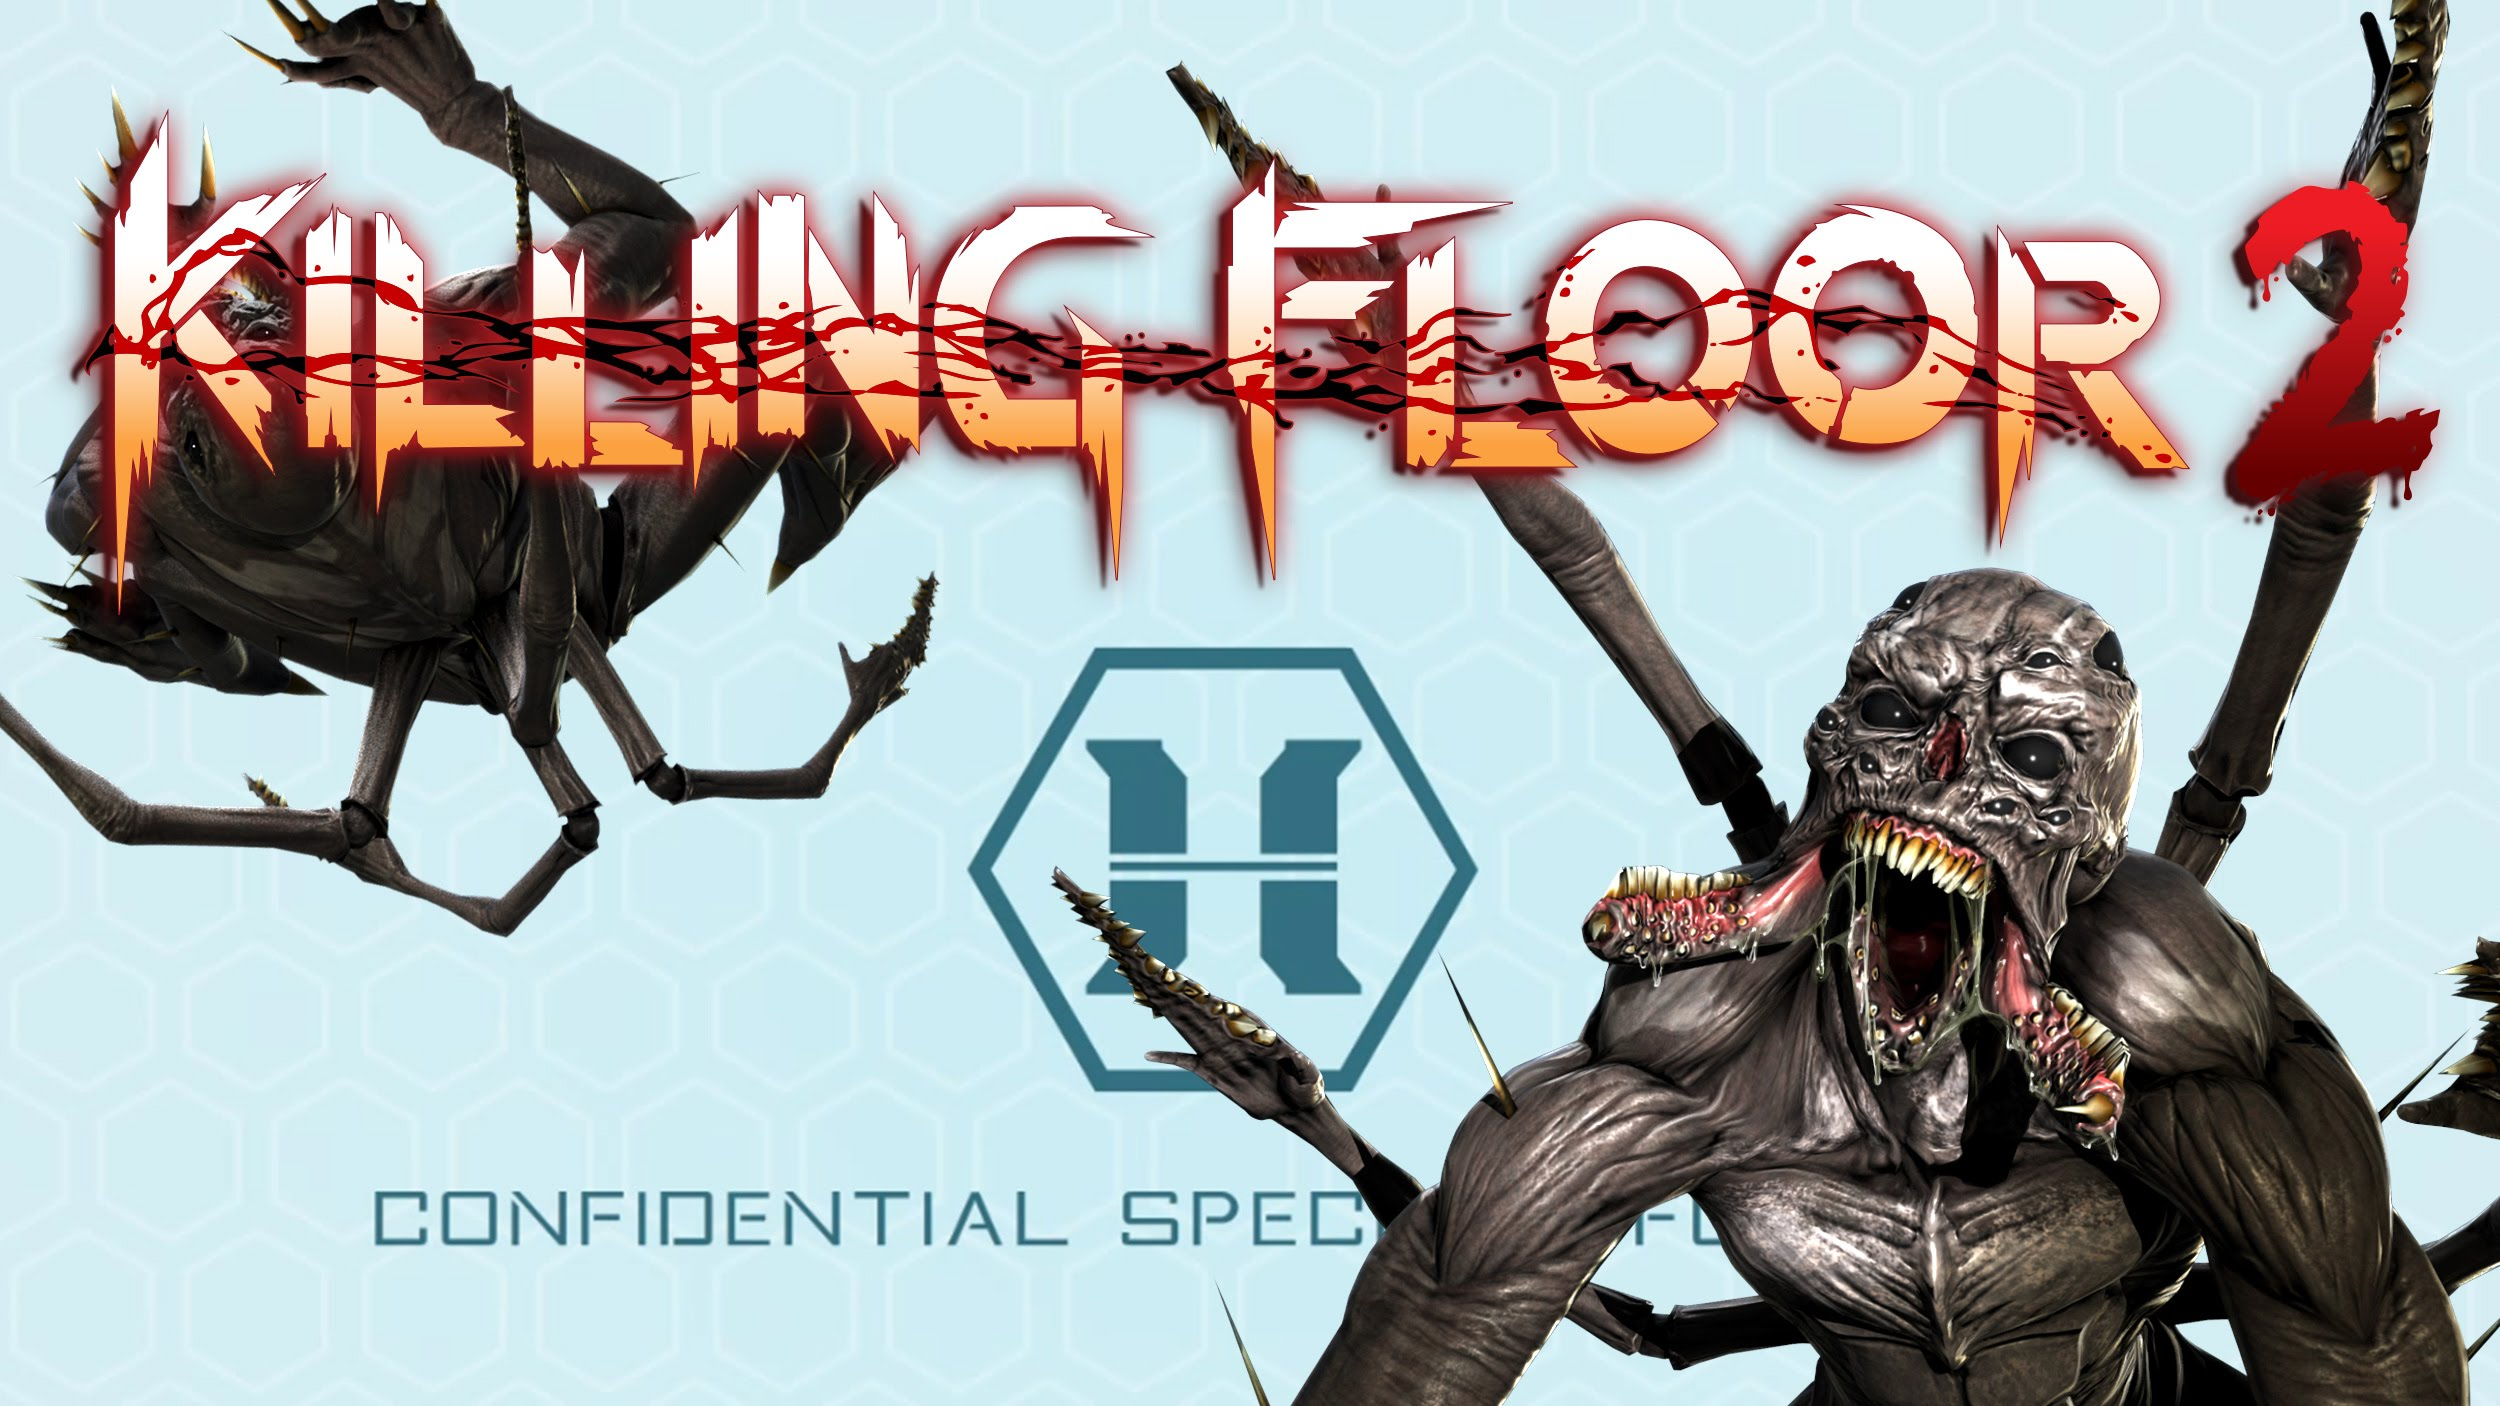 Killing Floor 2 - Horzine Biotech Confidential Specimen Footage: Part 1